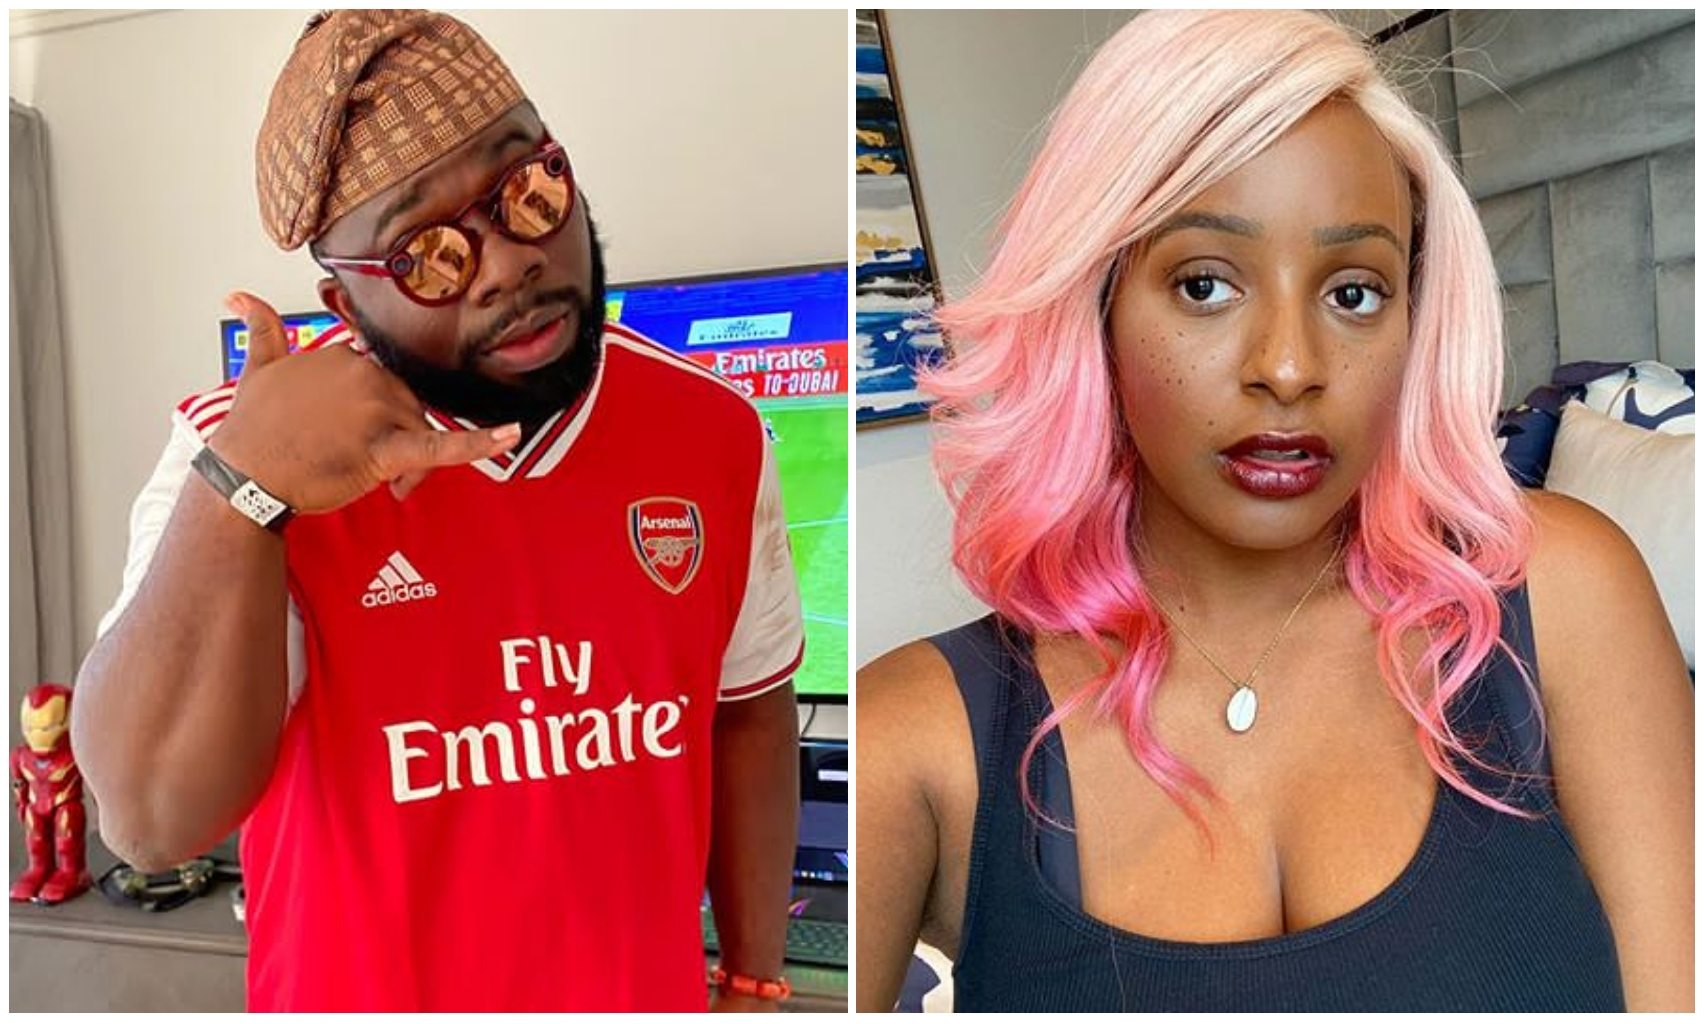 Hope you can still eat Jollof – Sport Analyst Kelechi Anyikude trolls DJ Cuppy as Man United face defeat (Photo)